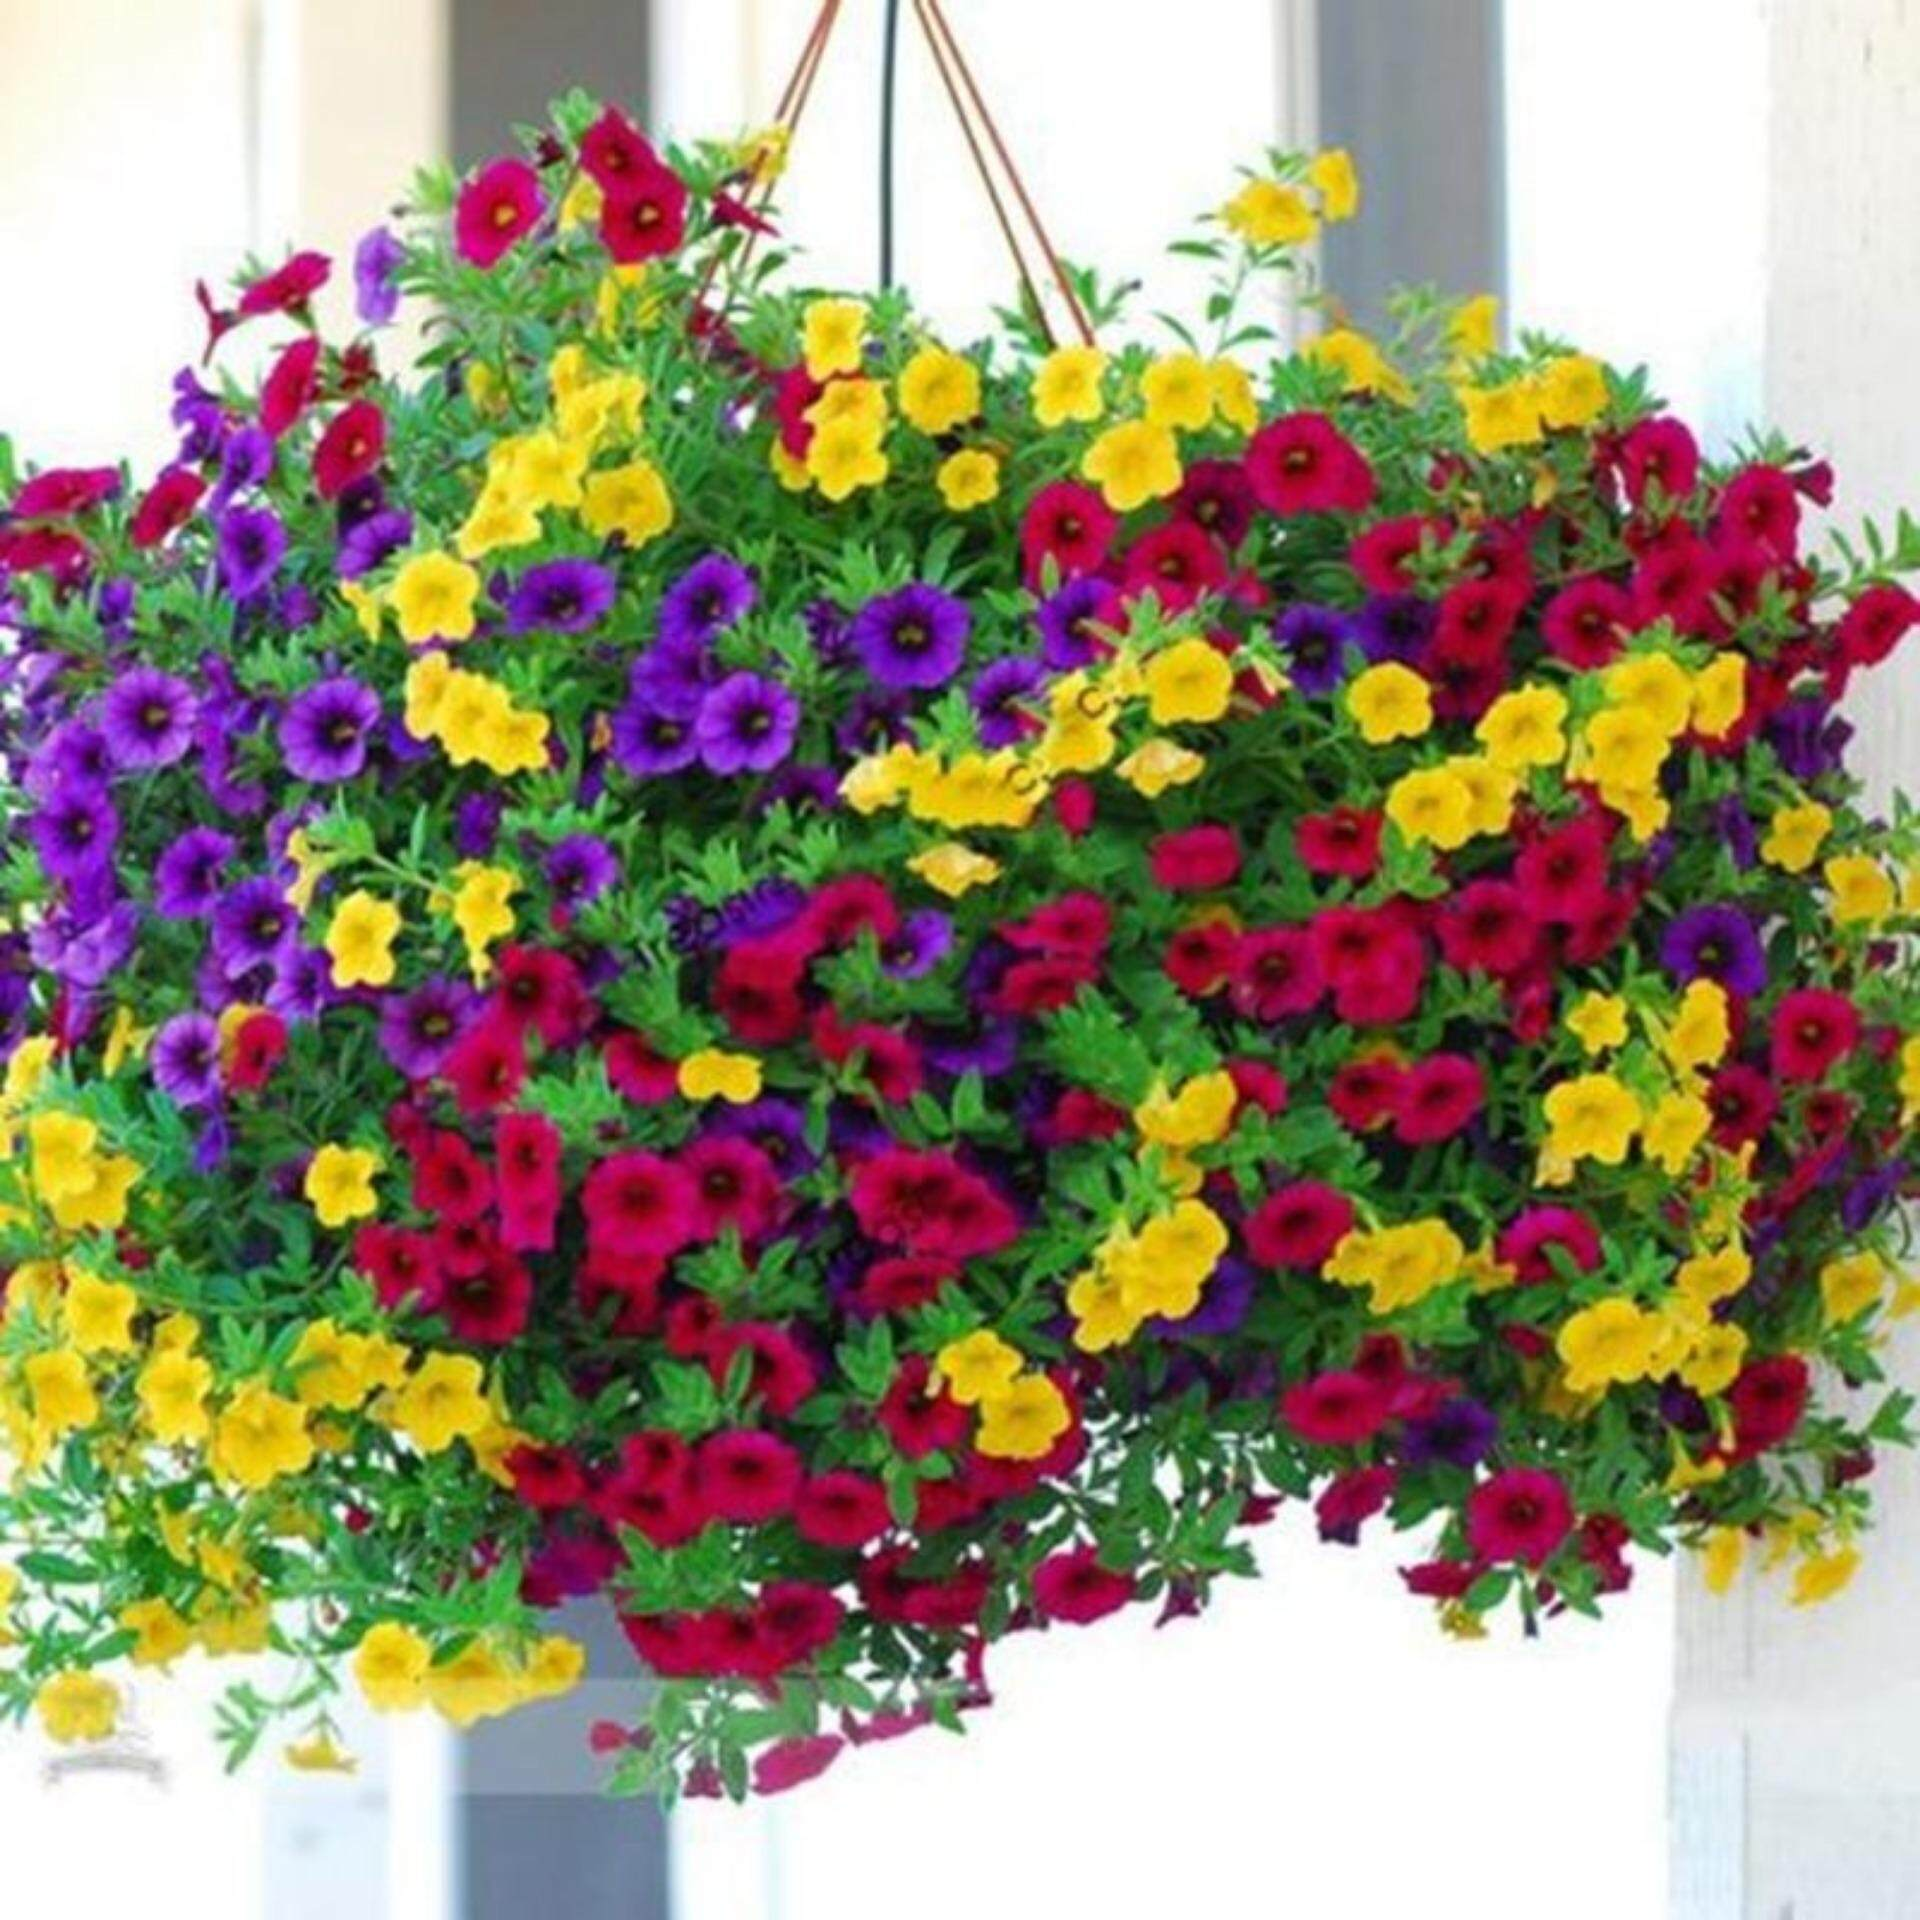 Sissi 1 pack 100 mixed petunia seeds heirloom hanging petunia garden flowers